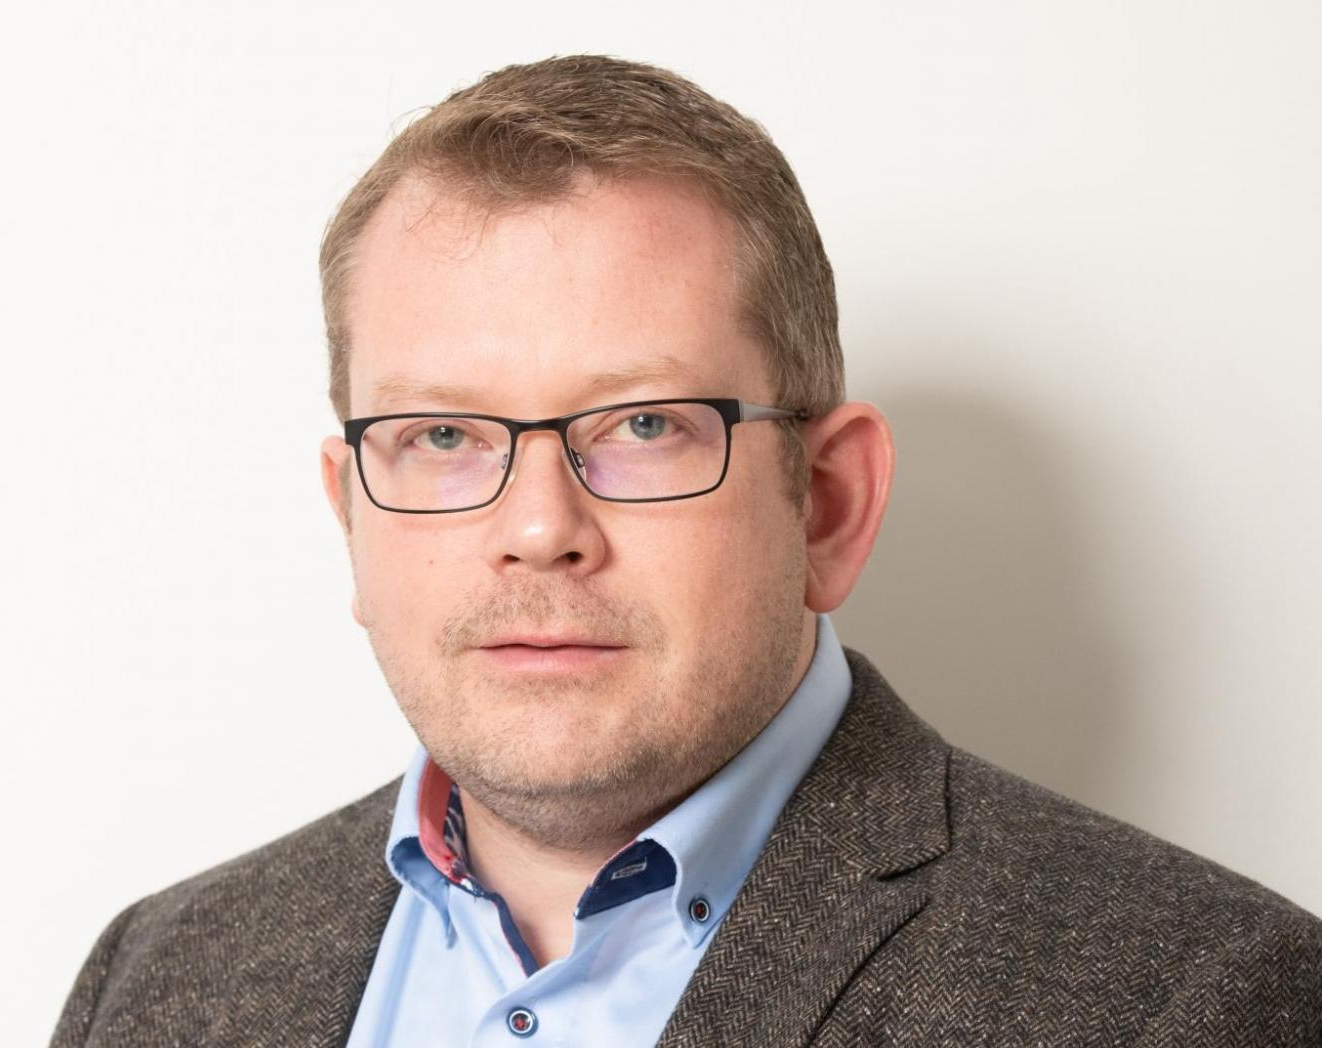 Schatzmeister VDBIO Andre Koenigs